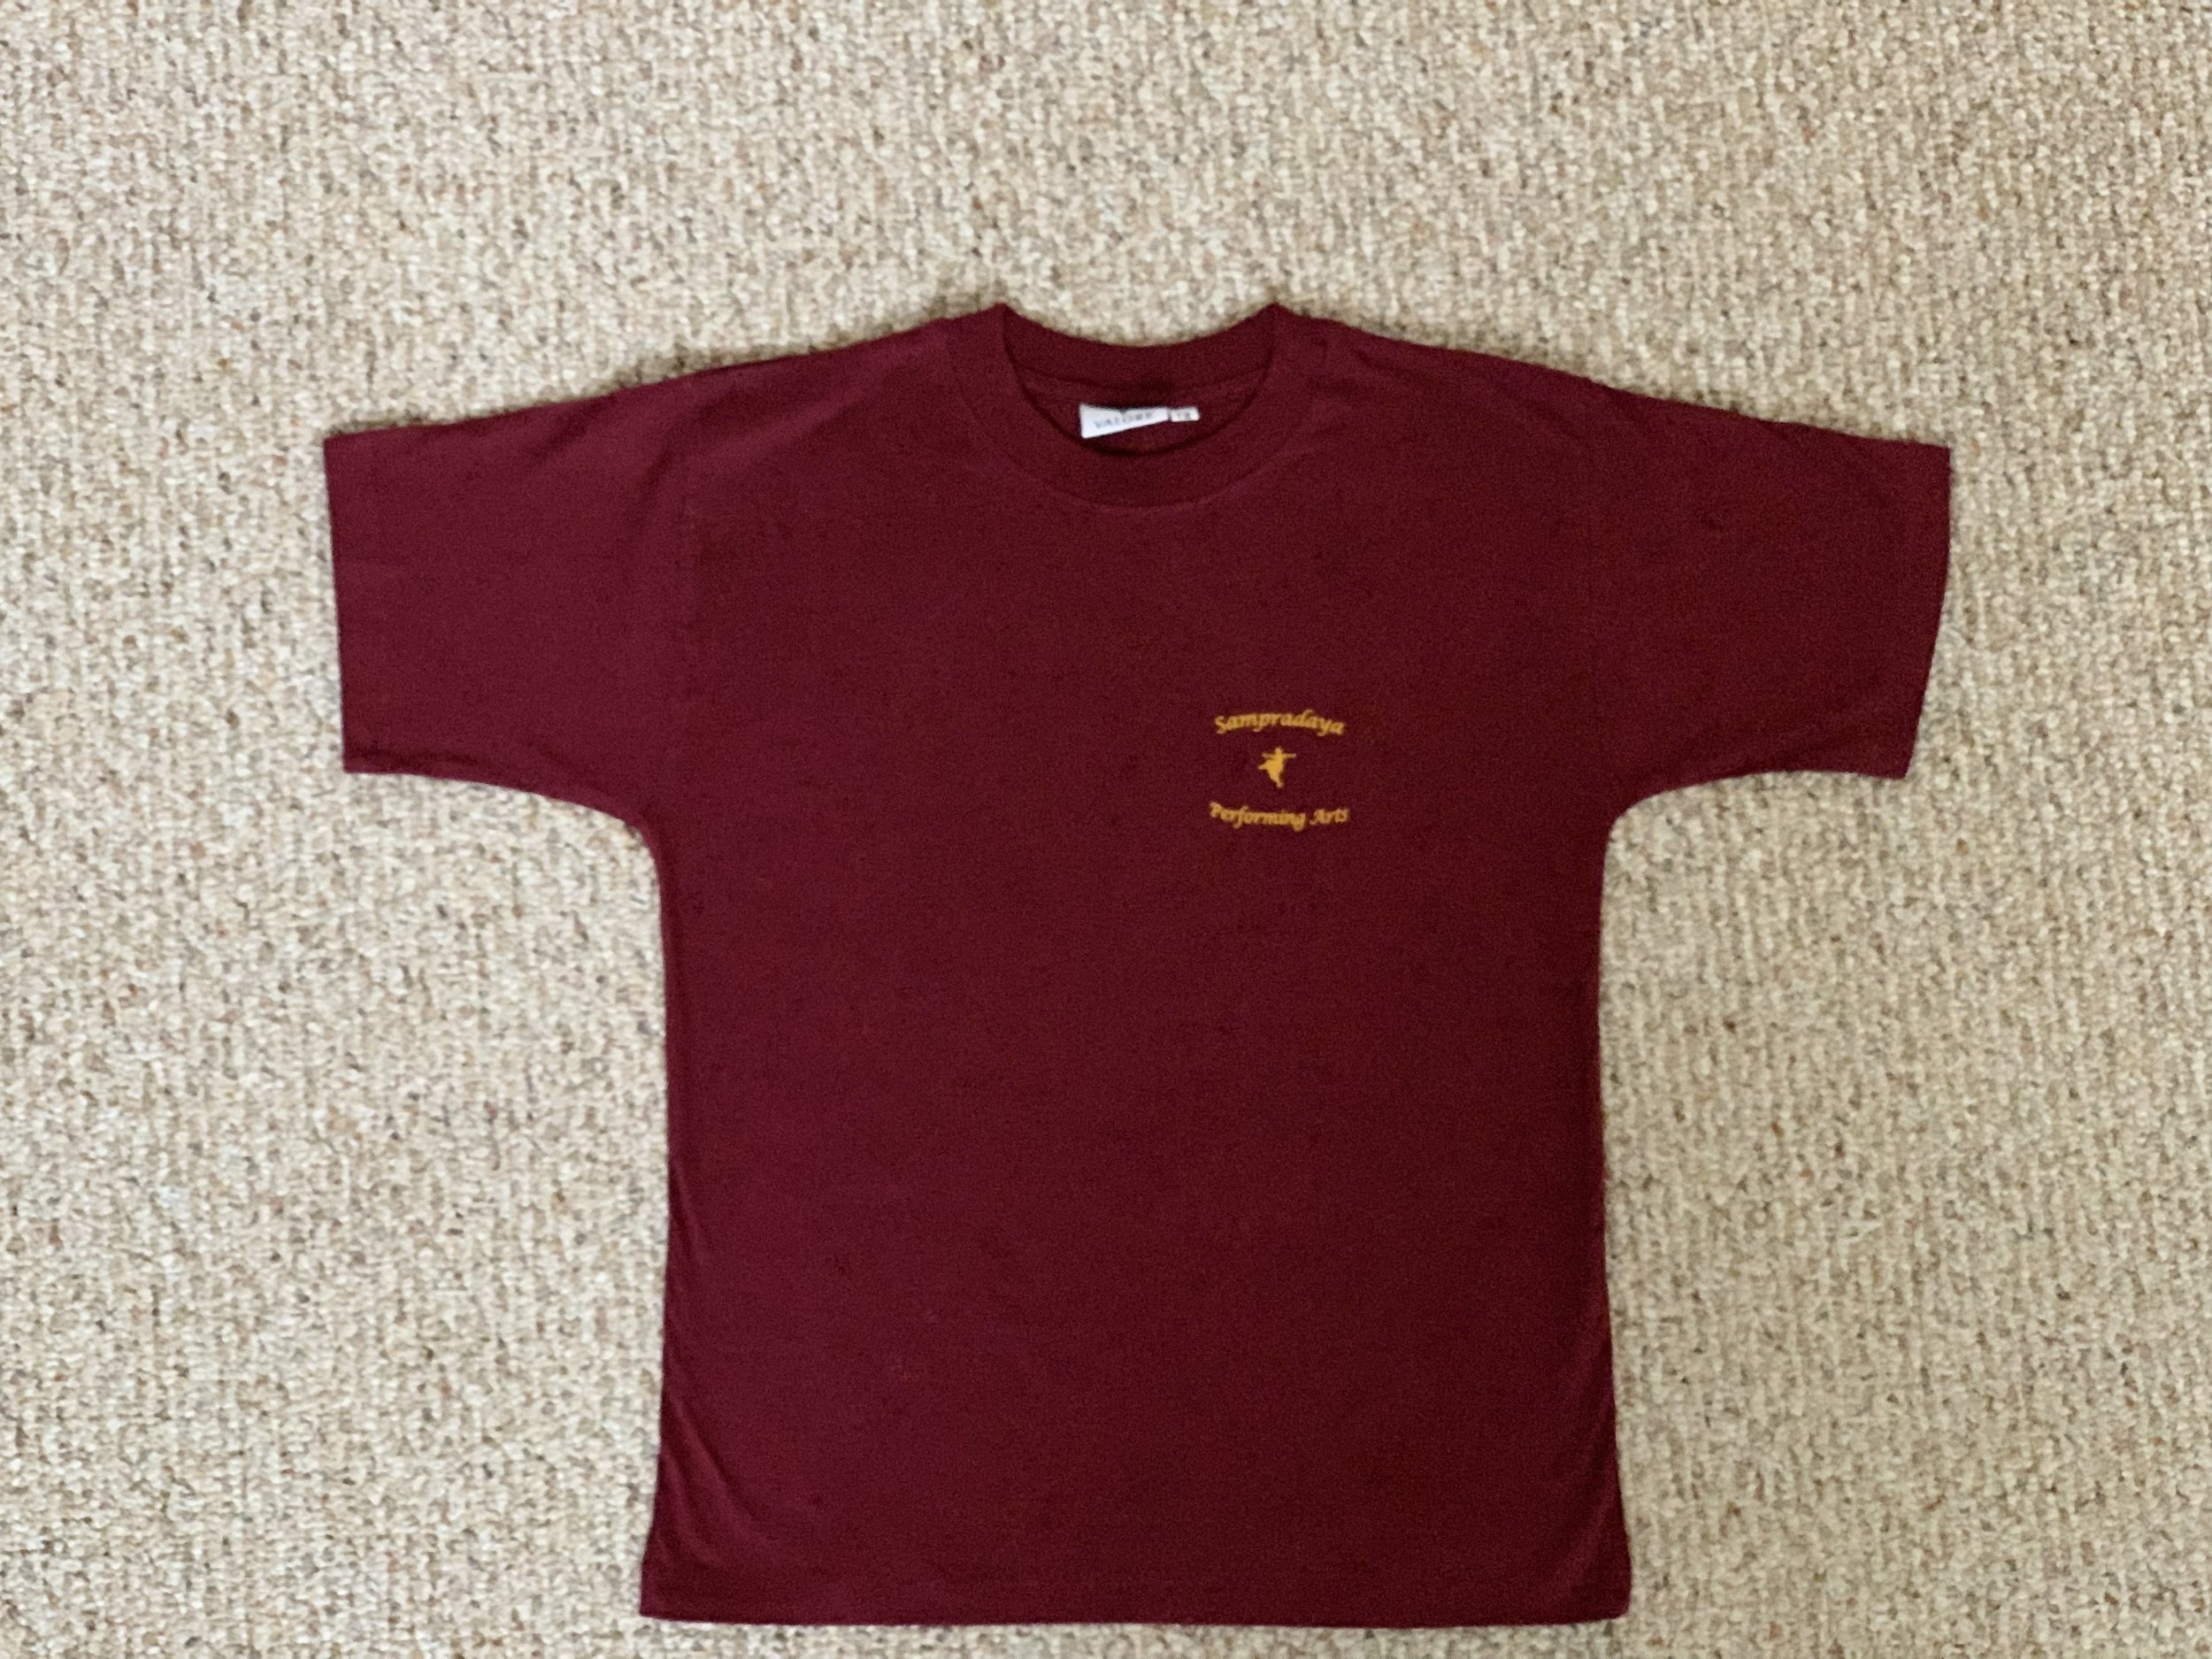 Sampradaya Shirt (Maroon and Orange) — FRONT